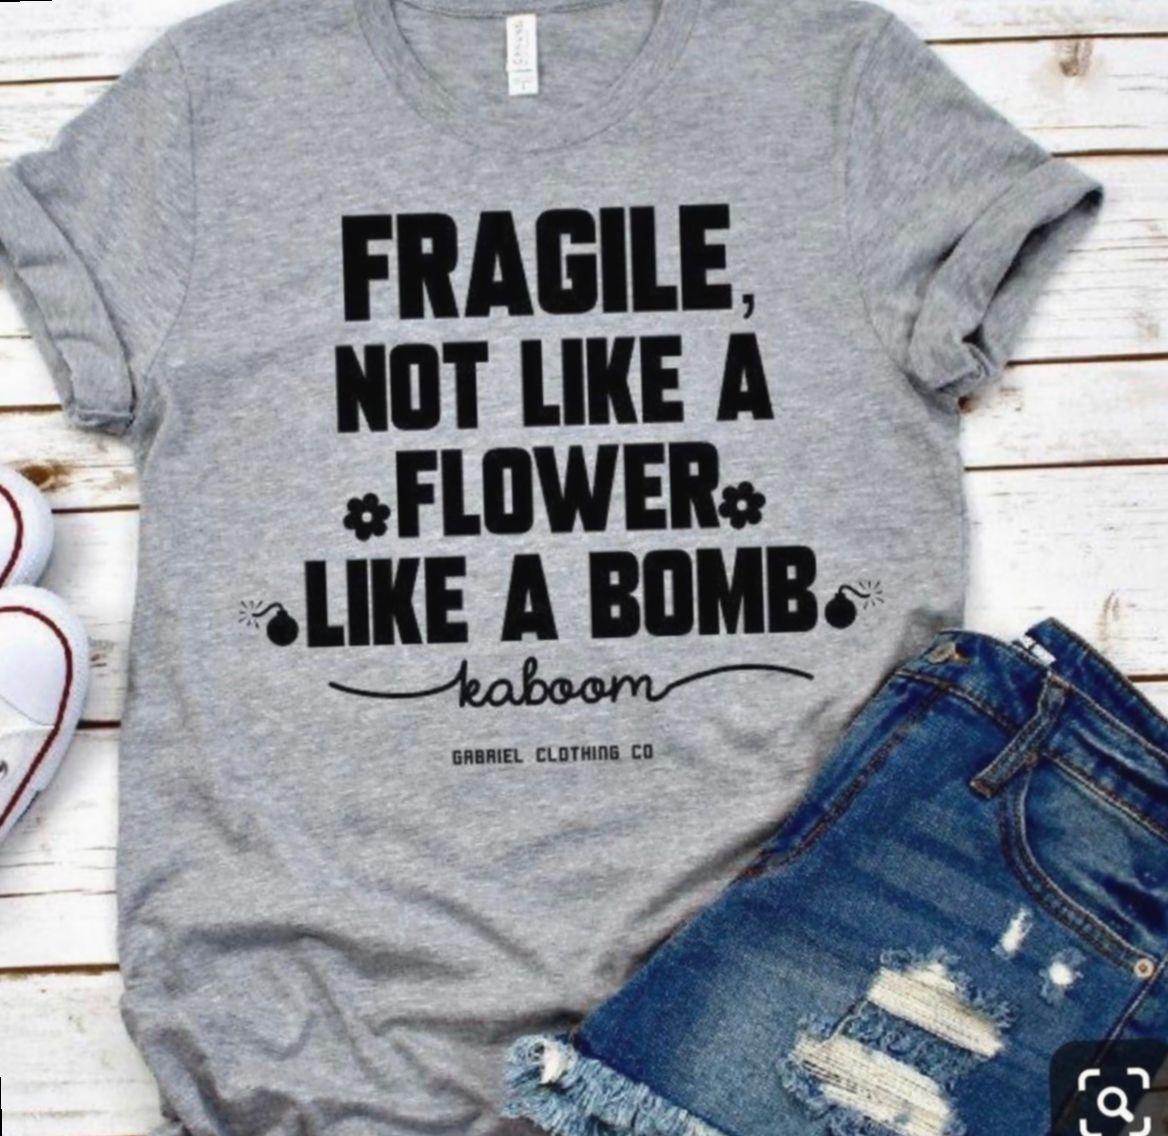 Cute Sayings For Girls Shirts Ensaioinfantil Mundorosa Maedemenina T Shirts For Women Shirt Designs Cute Shirts